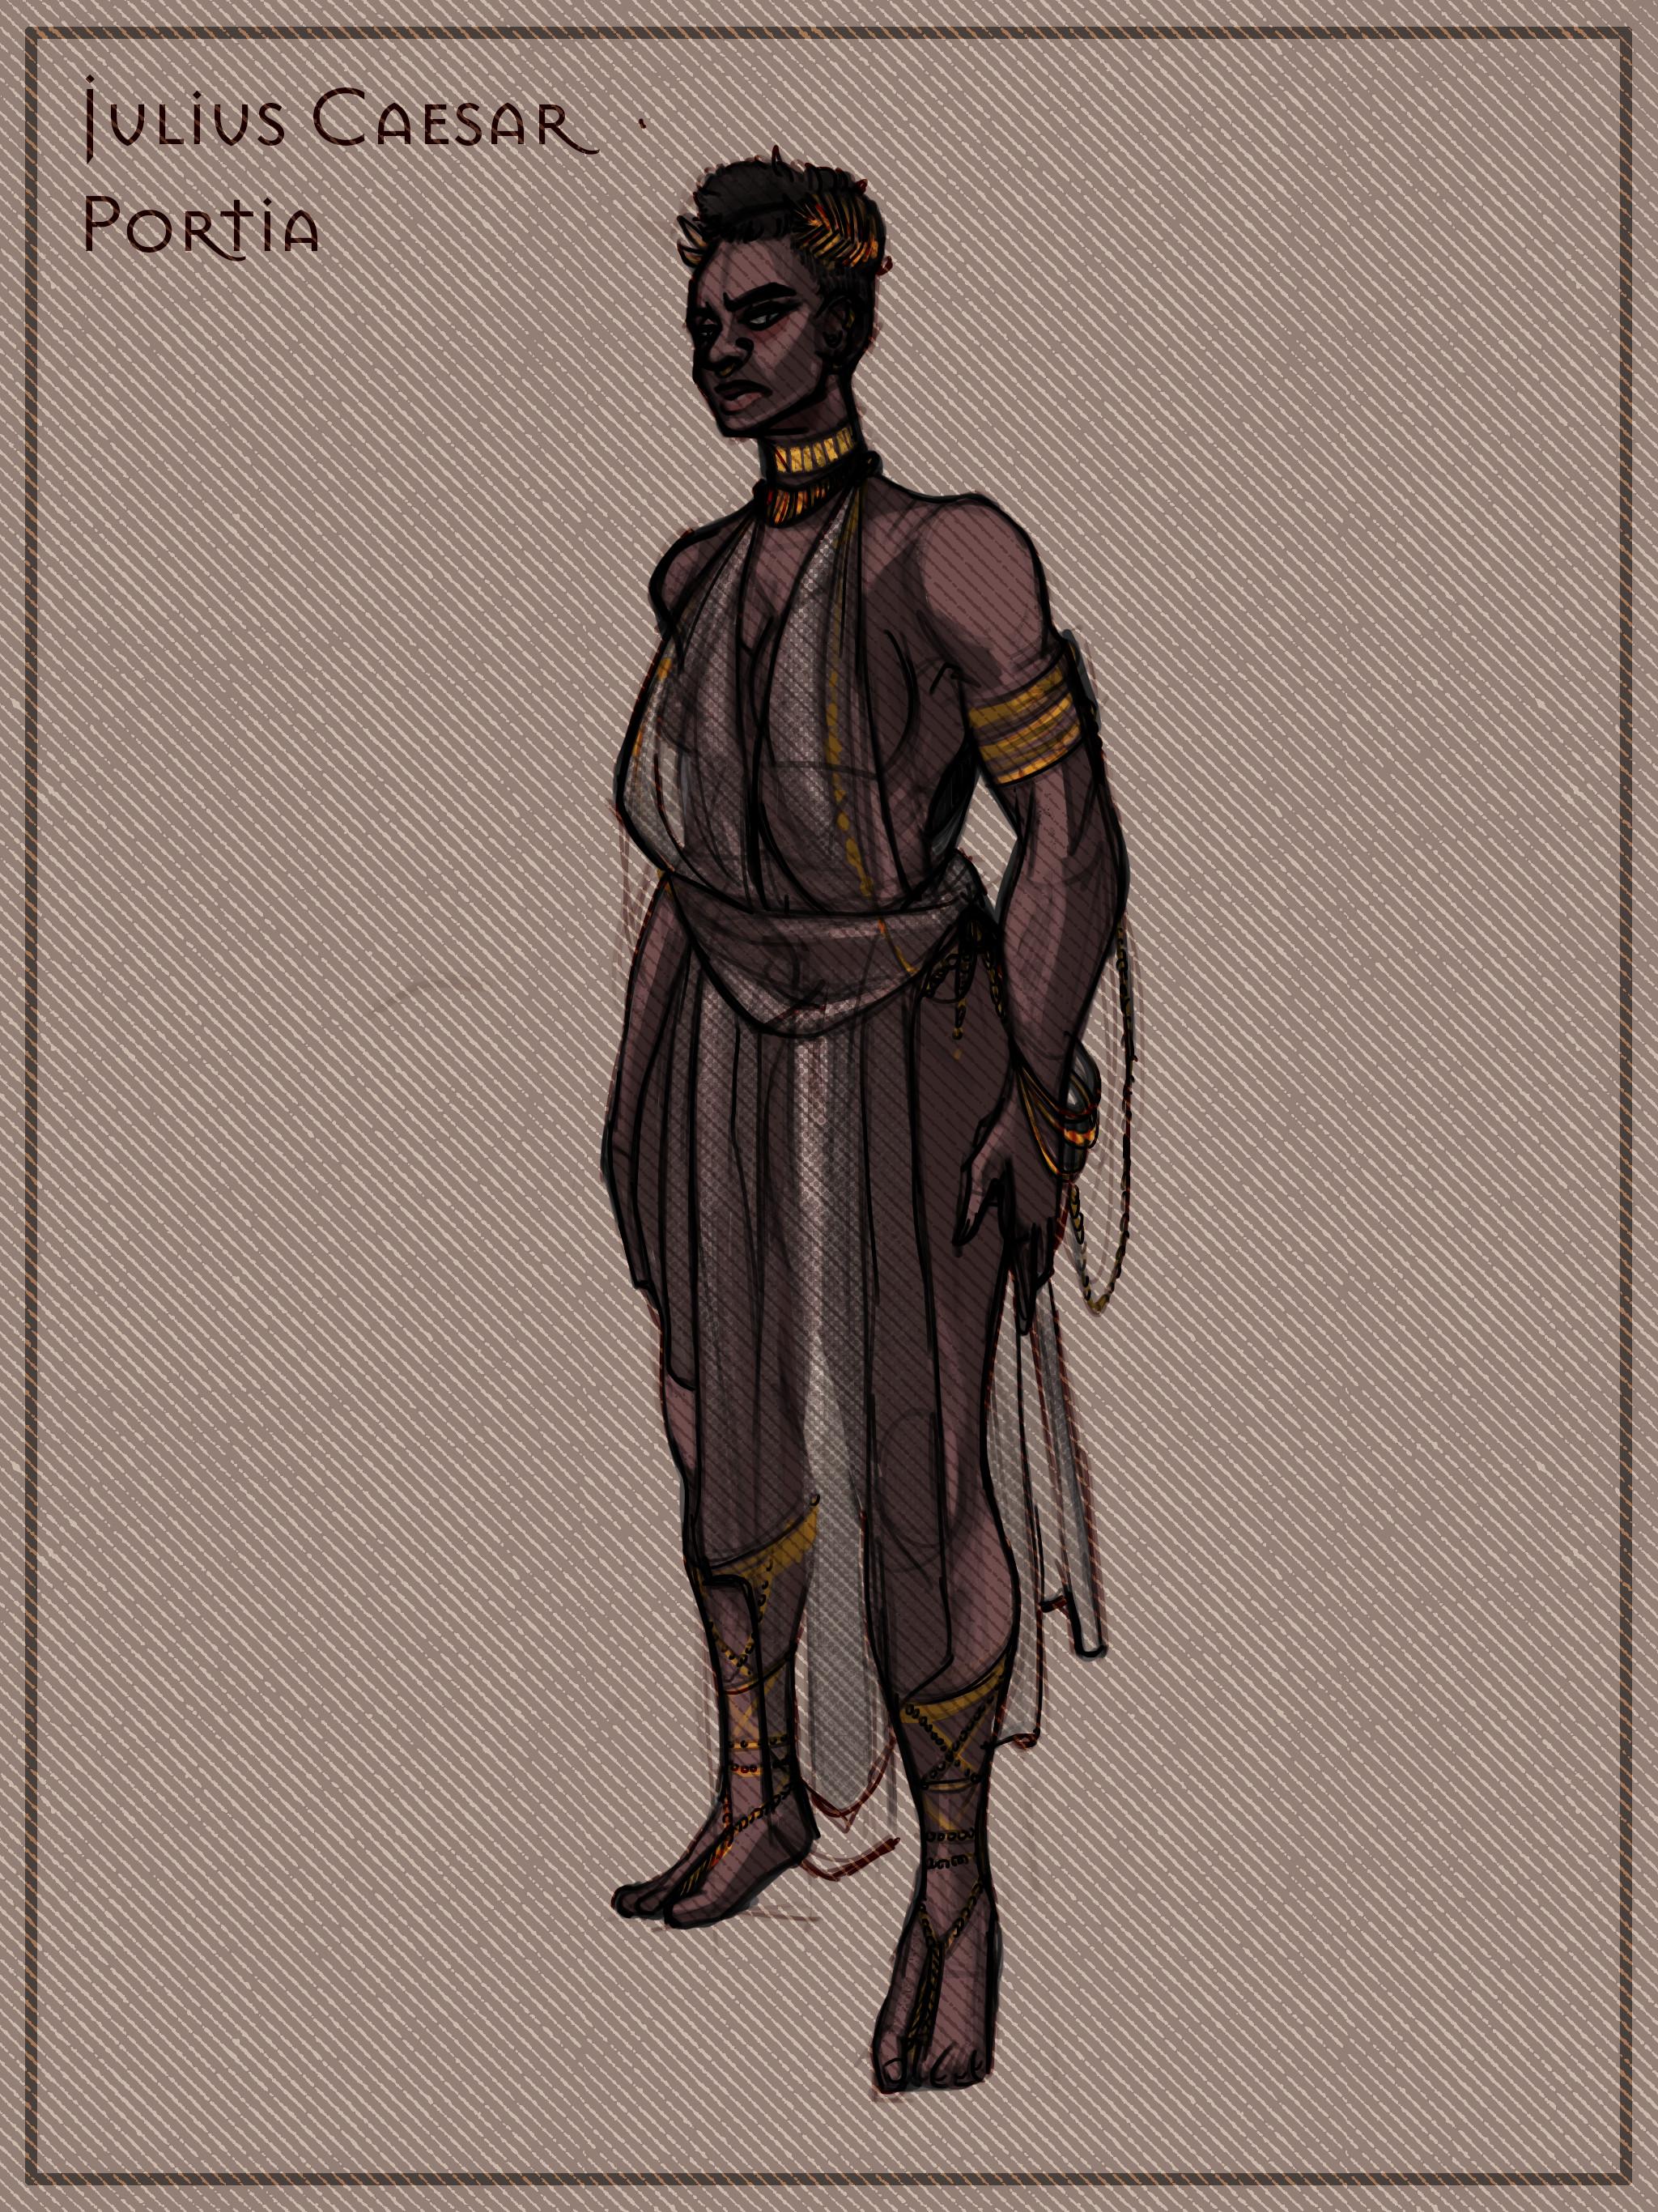 Portia, Brutus's wife